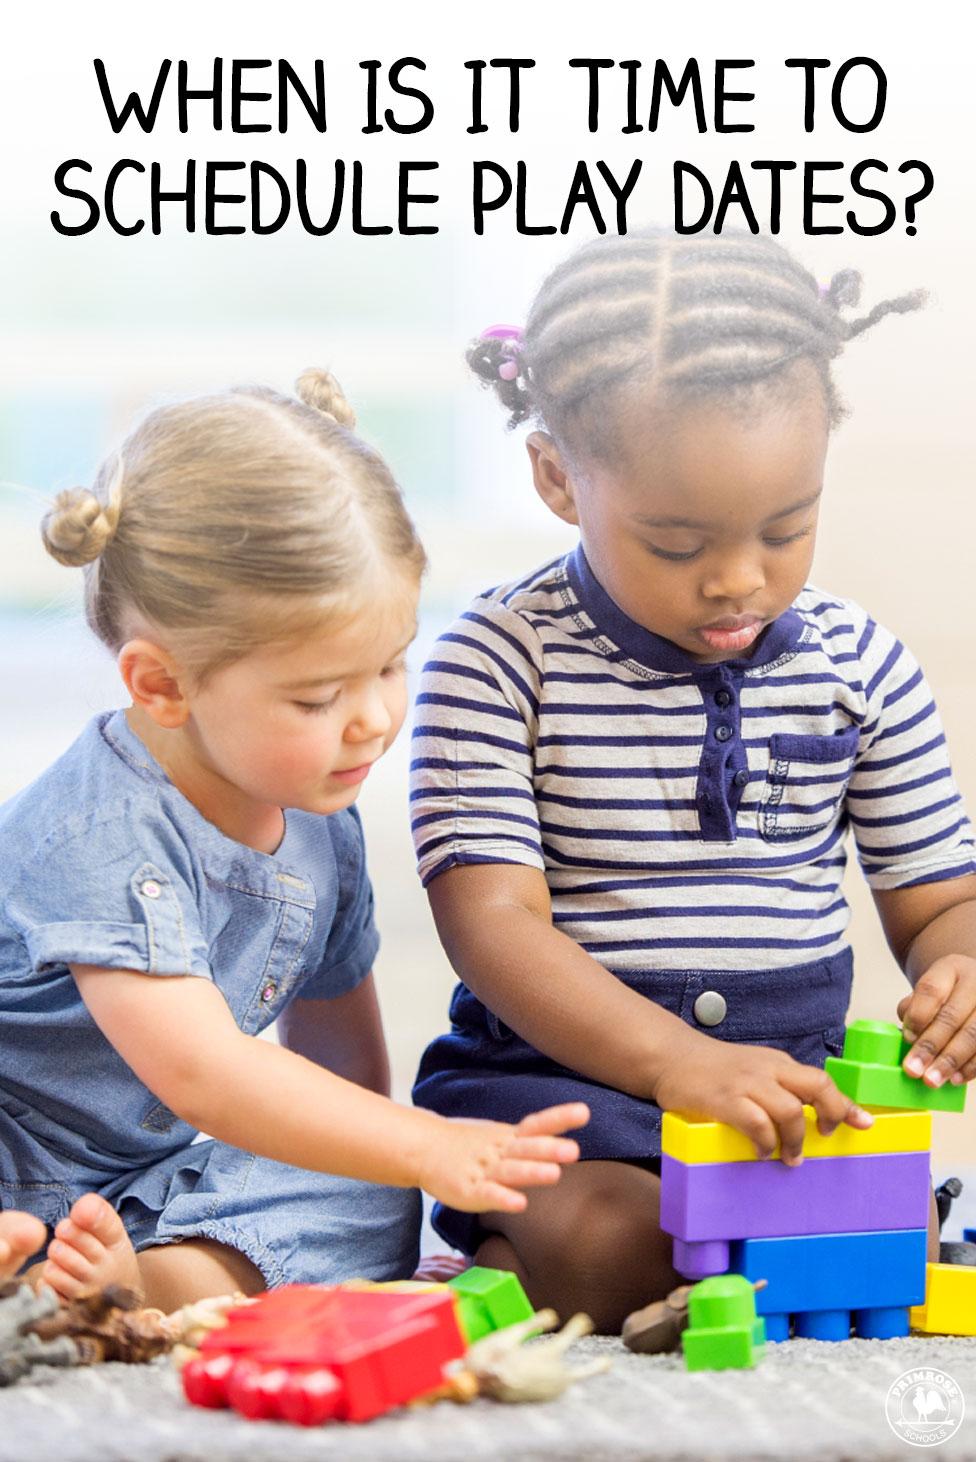 Scheduling Playdates for Your Children